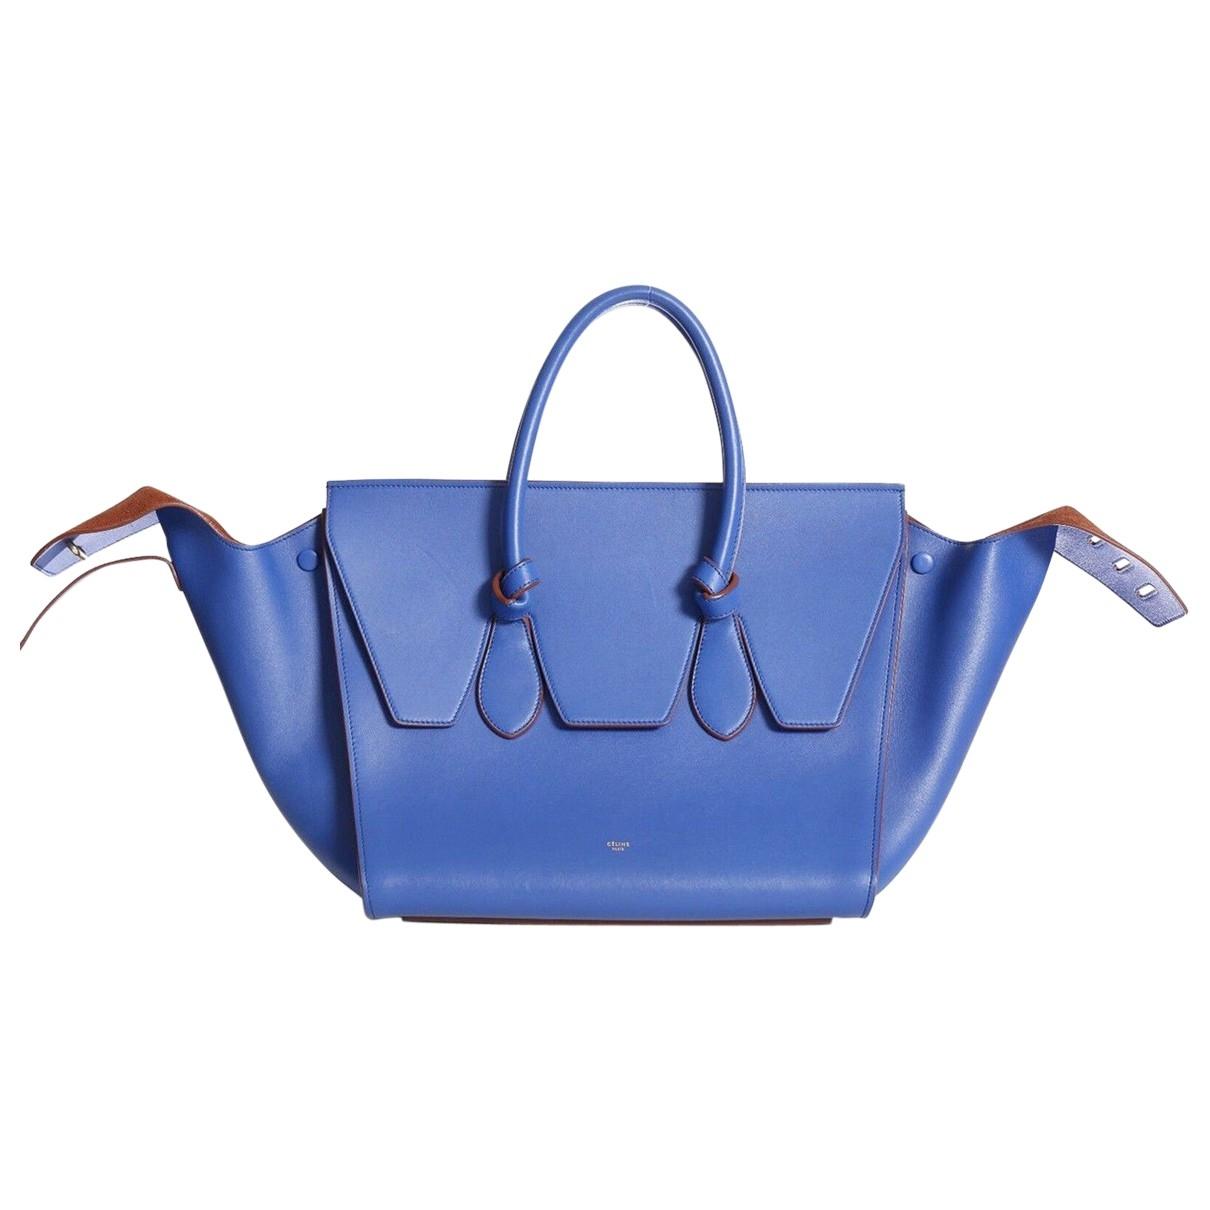 Celine Tie Blue Leather handbag for Women \N